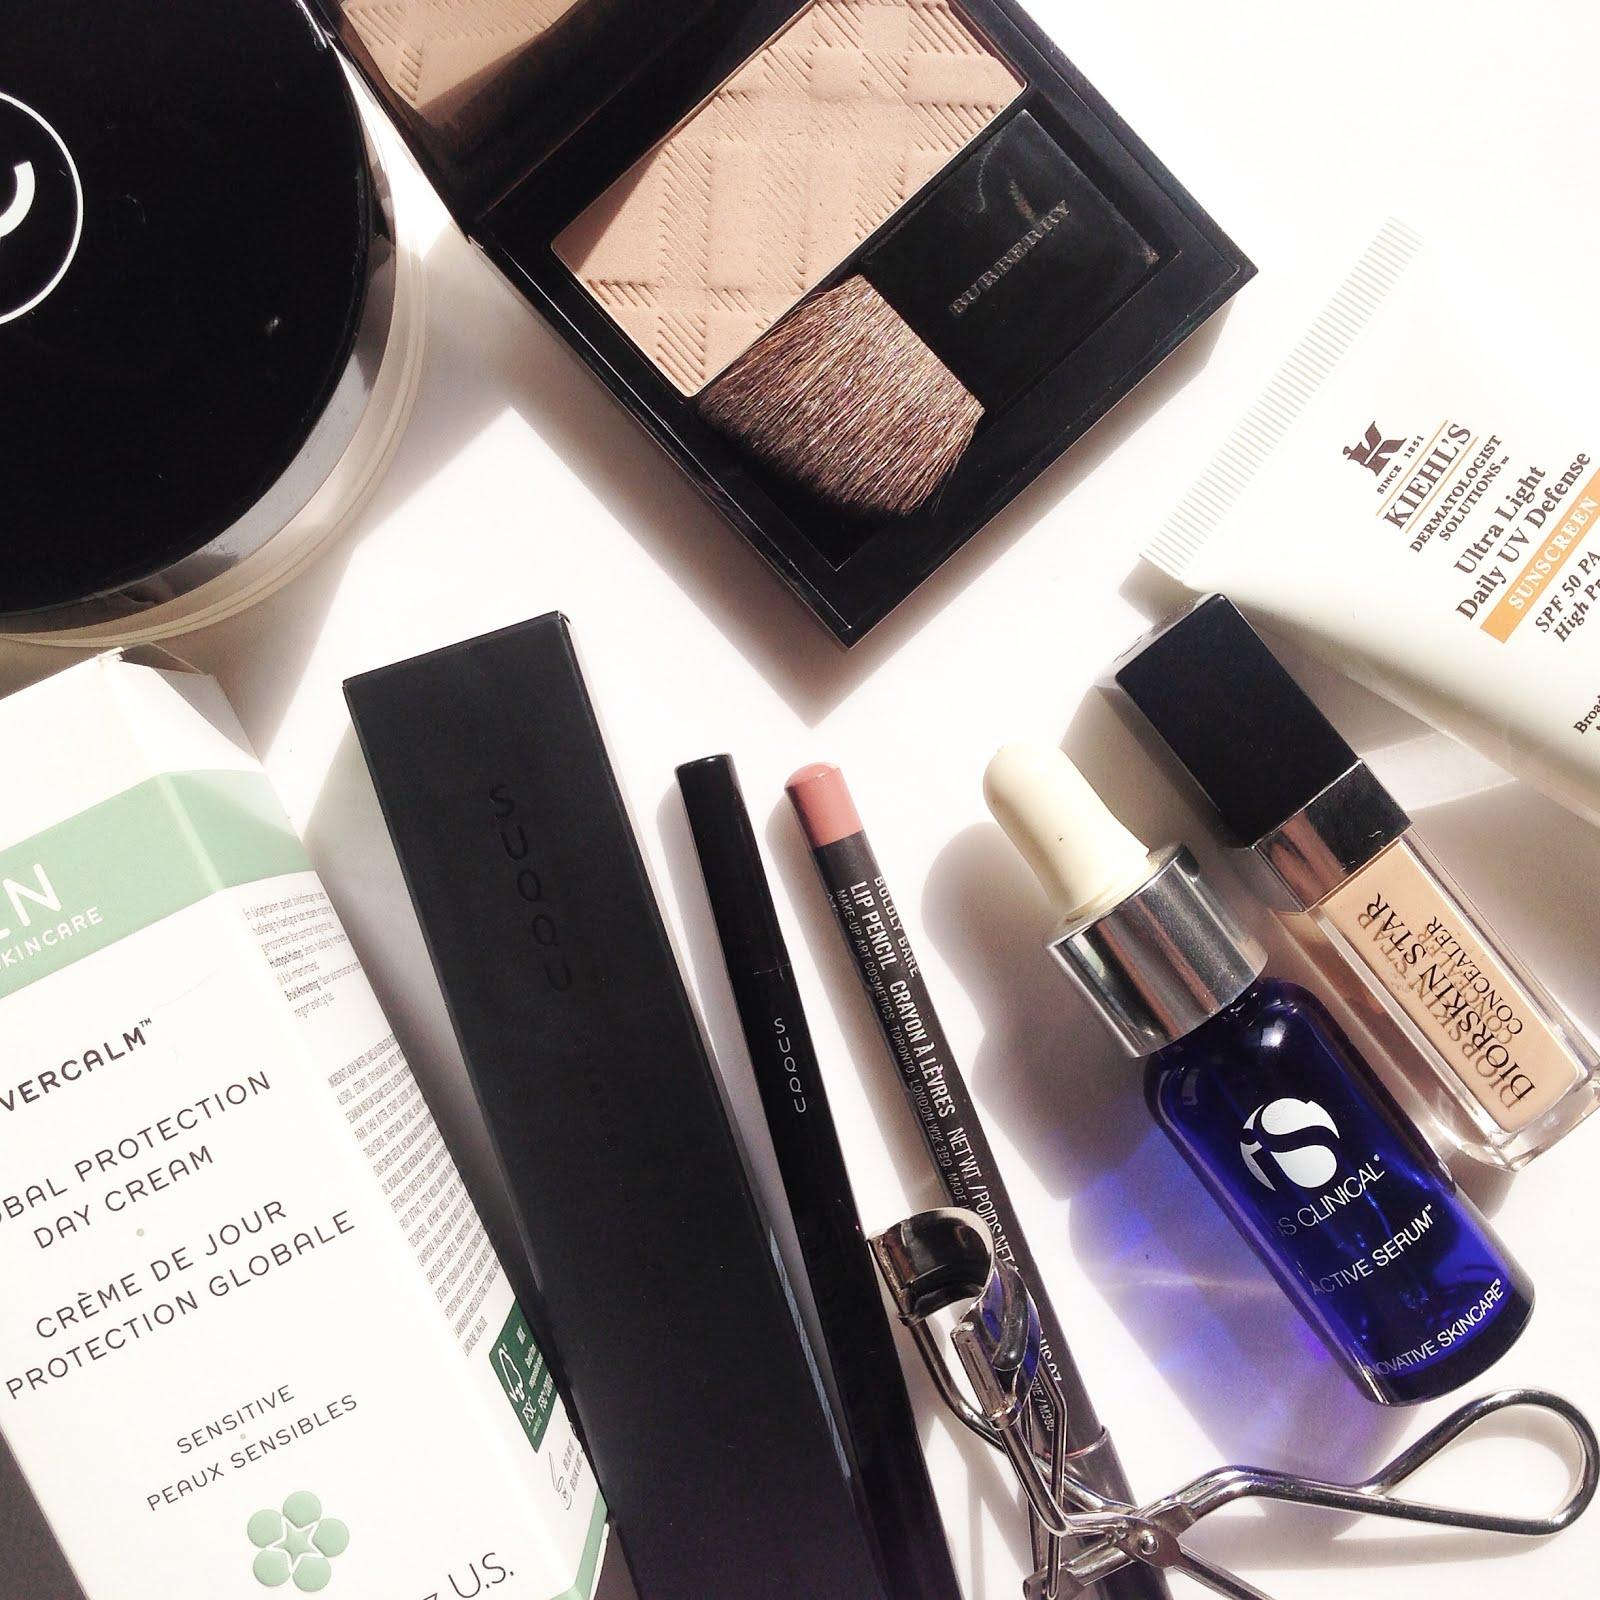 Sleeping With Makeup Suqqu Eyebrow Liquid Pen R In 01 Moss Green